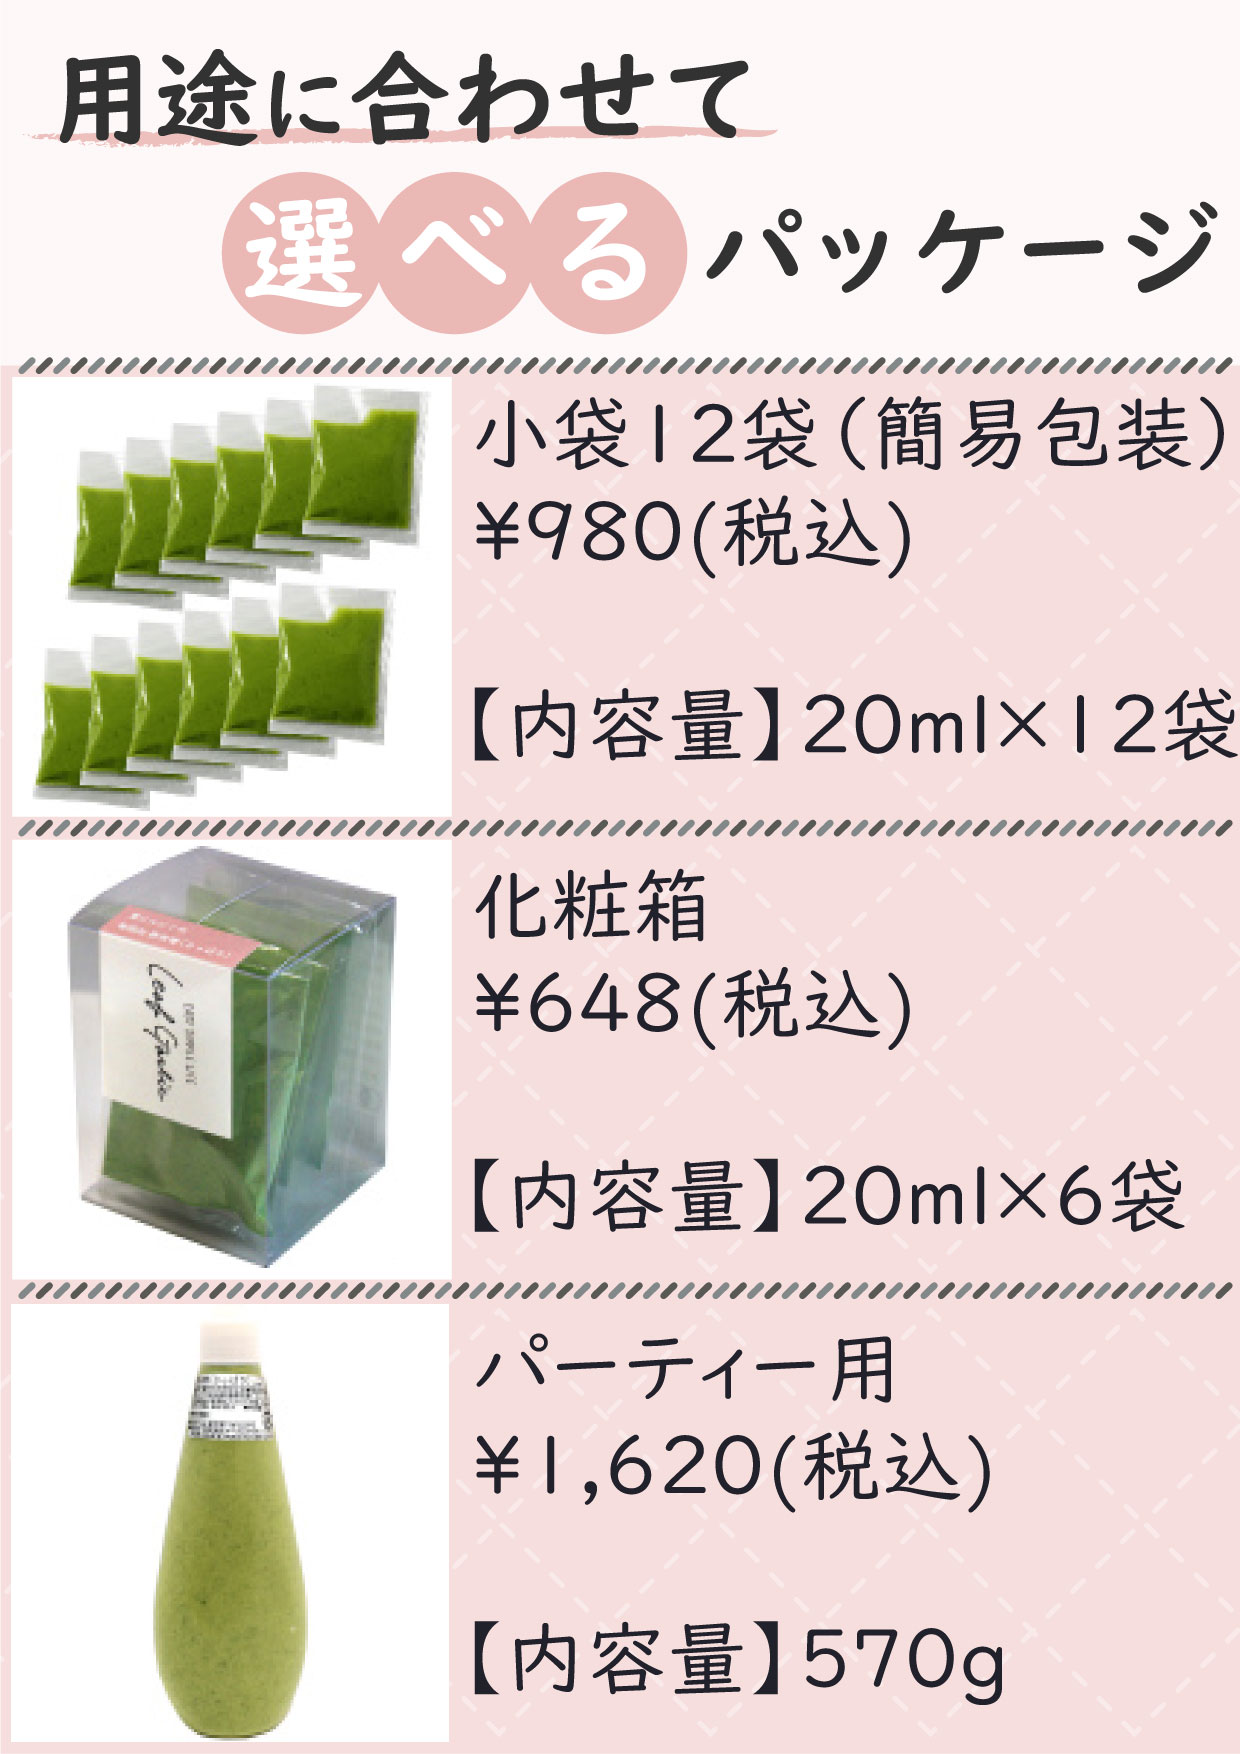 Leaf Garlic 酢味噌(さっぱり)